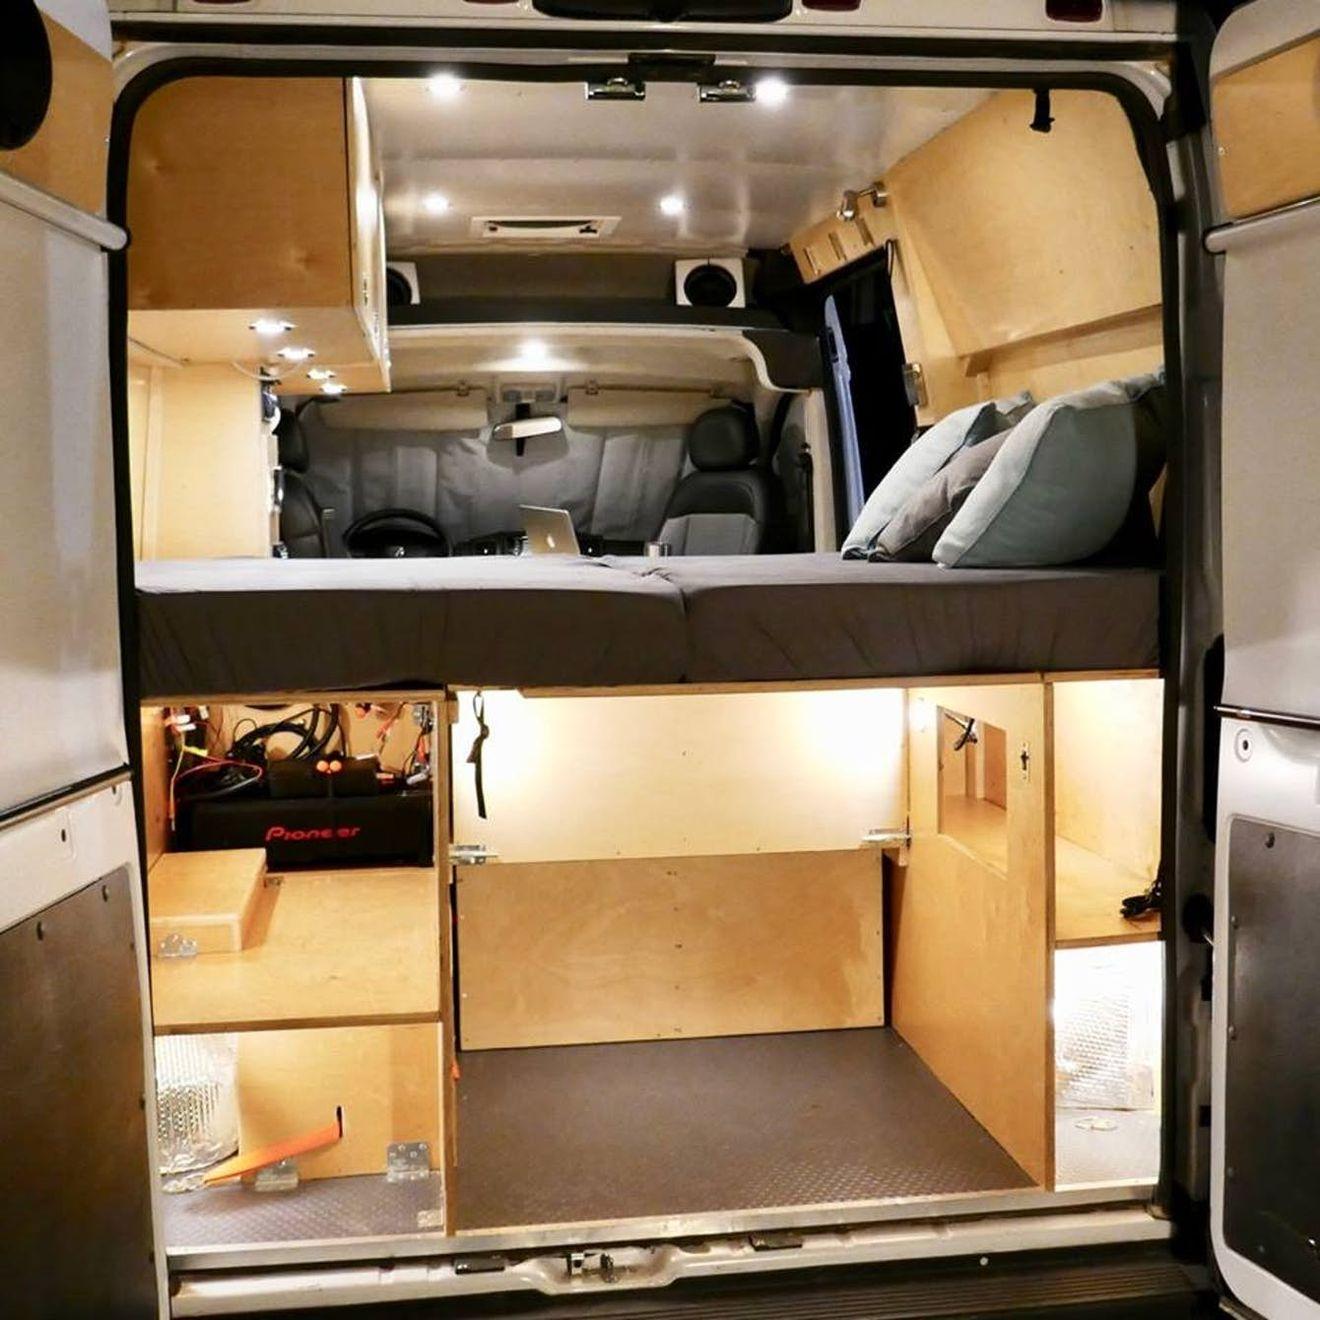 Affordable Camper Van Comes With A Rooftop Deck Camper Van Conversion Diy Truck Campers For Sale Used Camper Vans